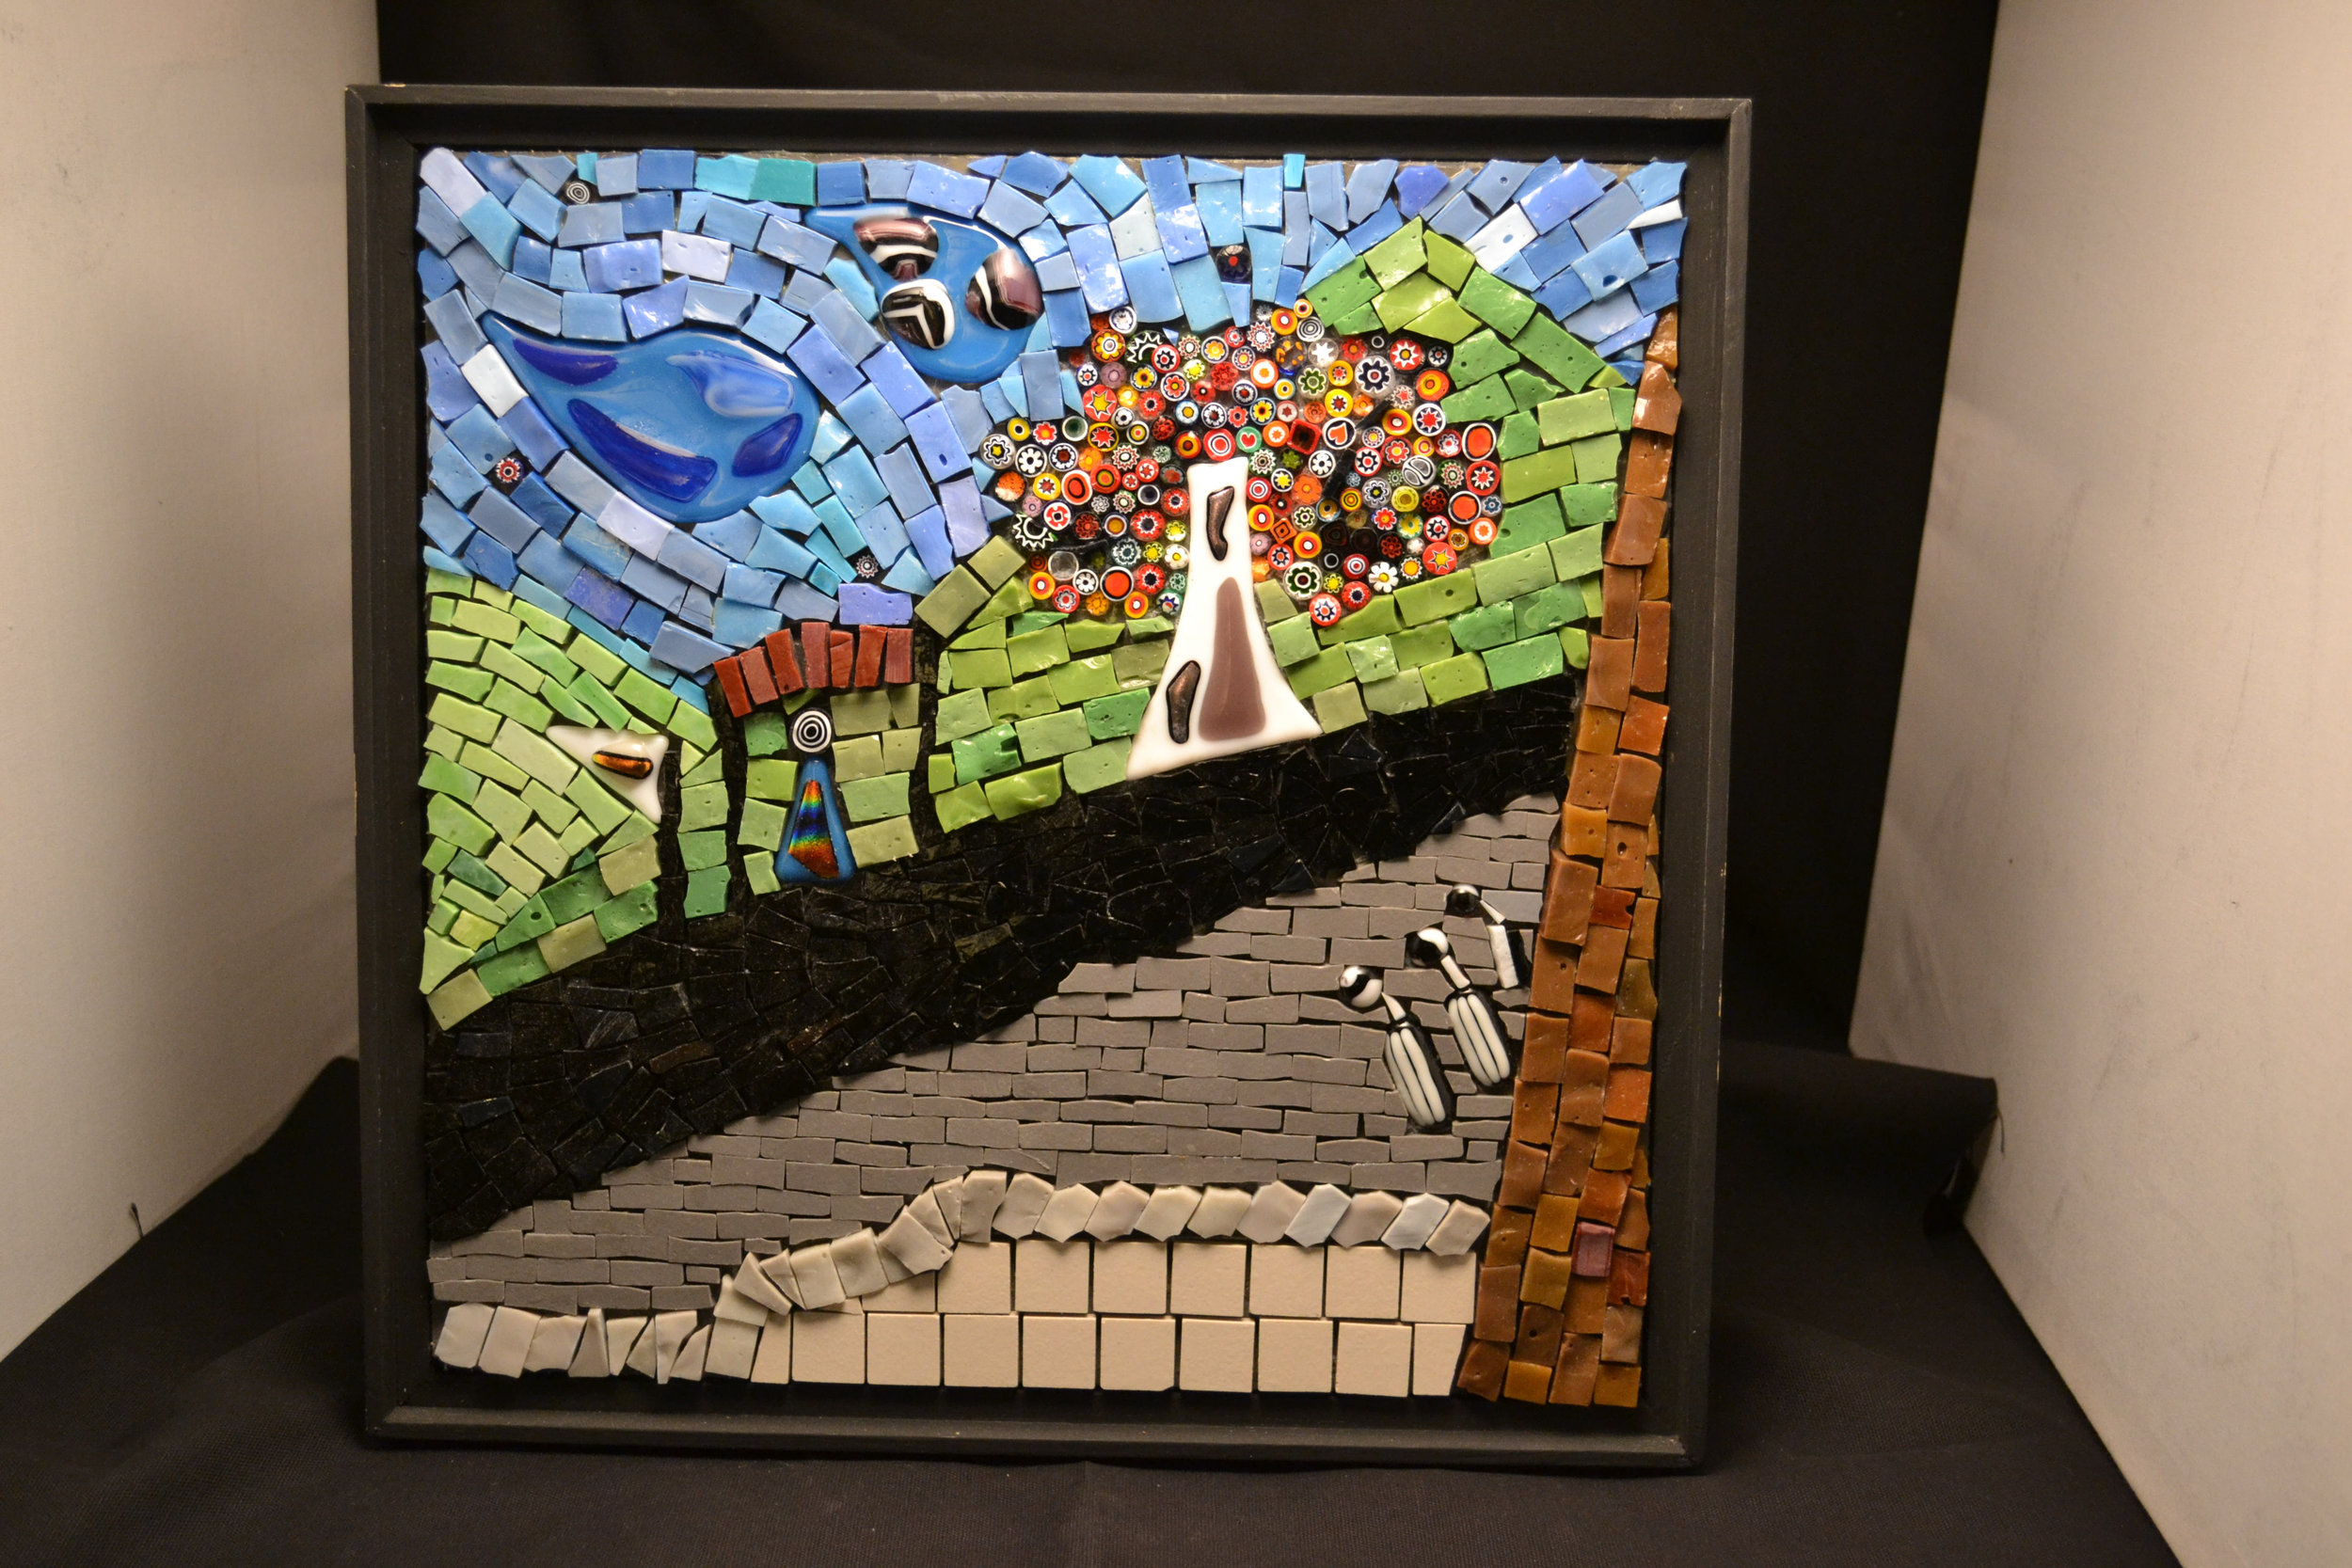 Mosaic2.14.14_1 copy.jpg